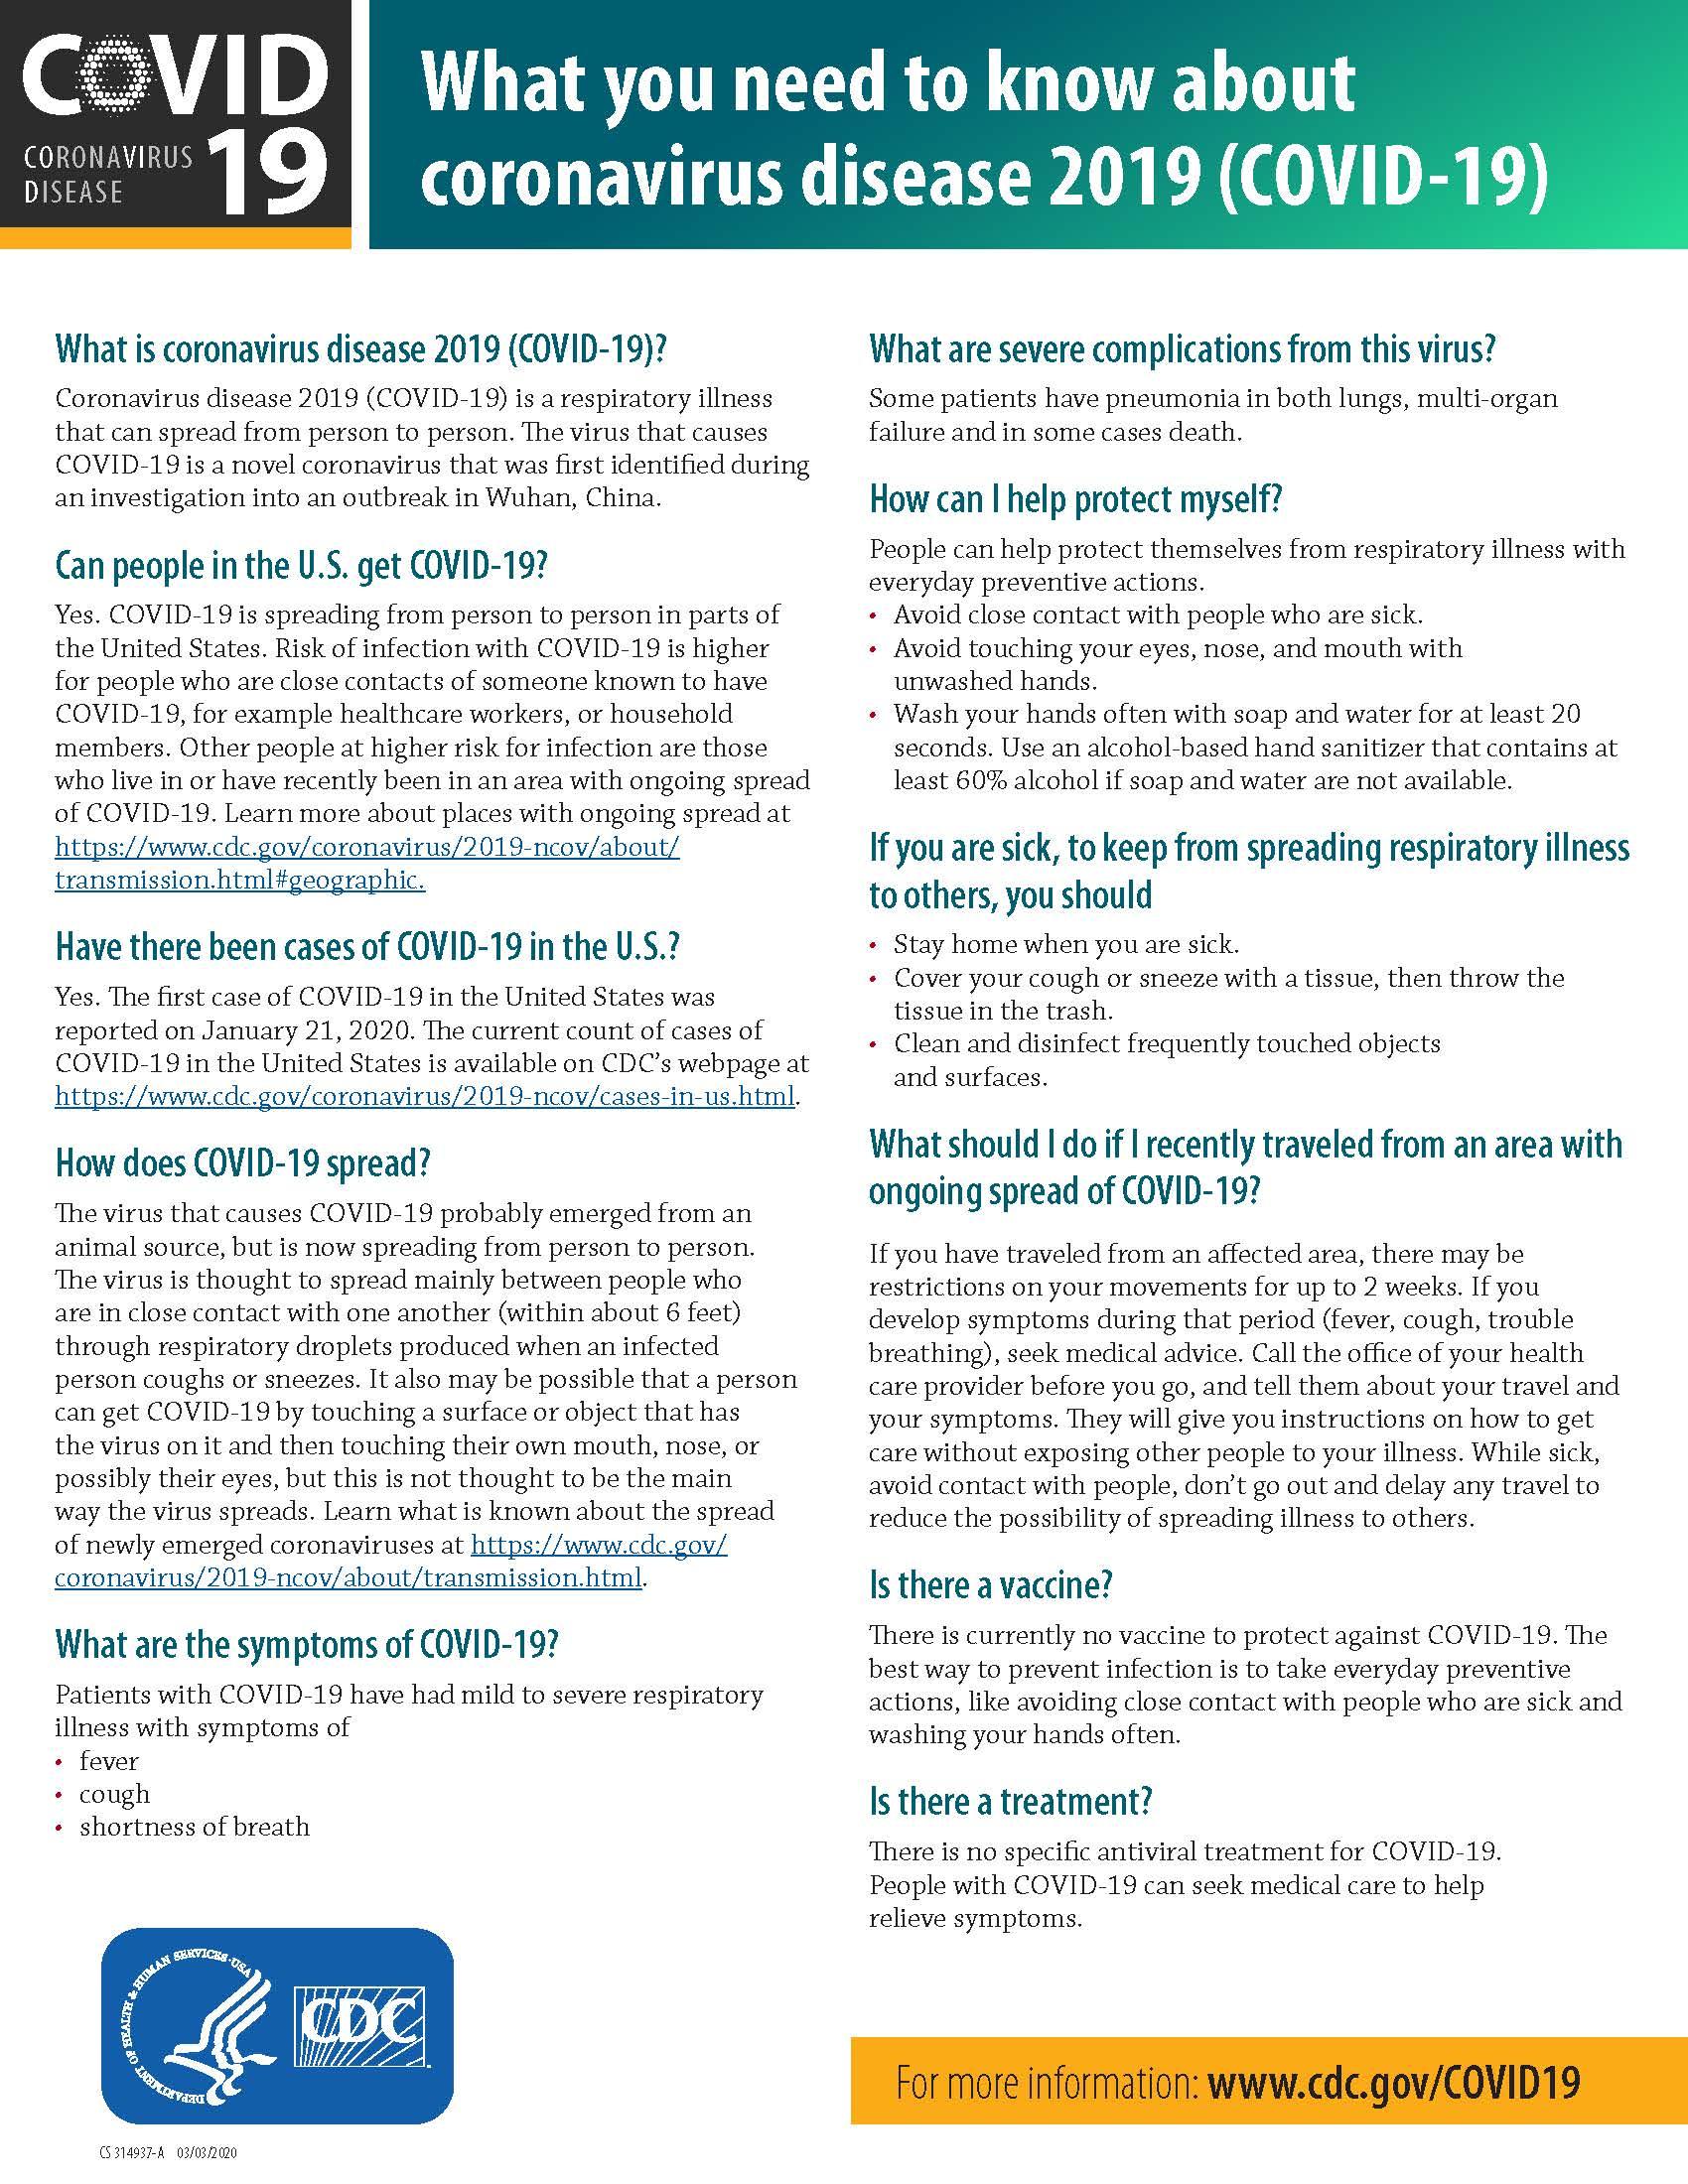 Centers For Disease Control Fact Sheet: Covid-19 (Coronavirus ...